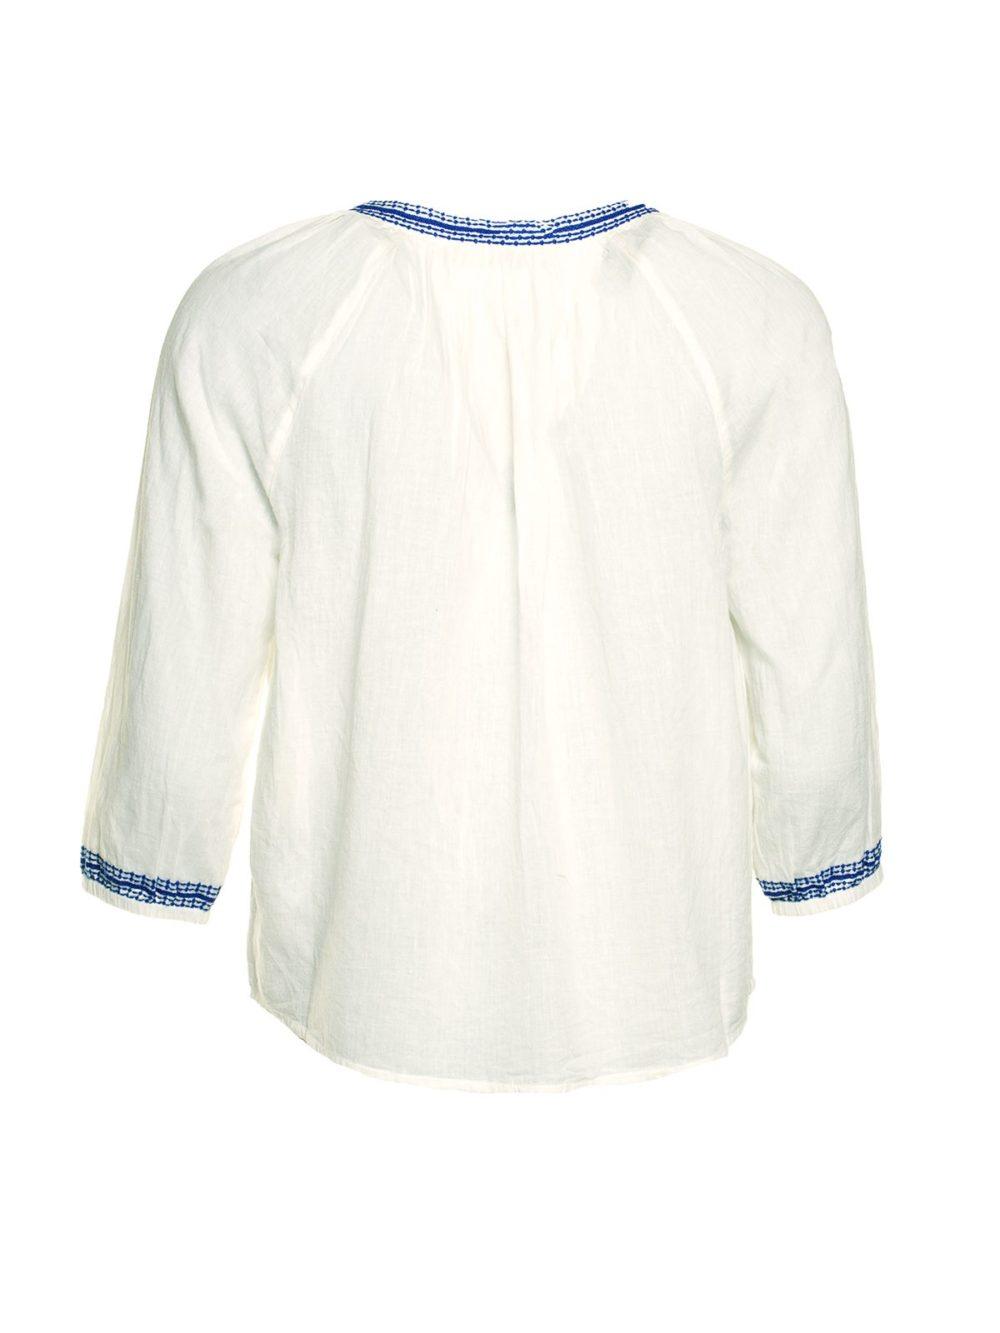 Embrodery Details Top Nice Things Katie Kerr Women's Clothing